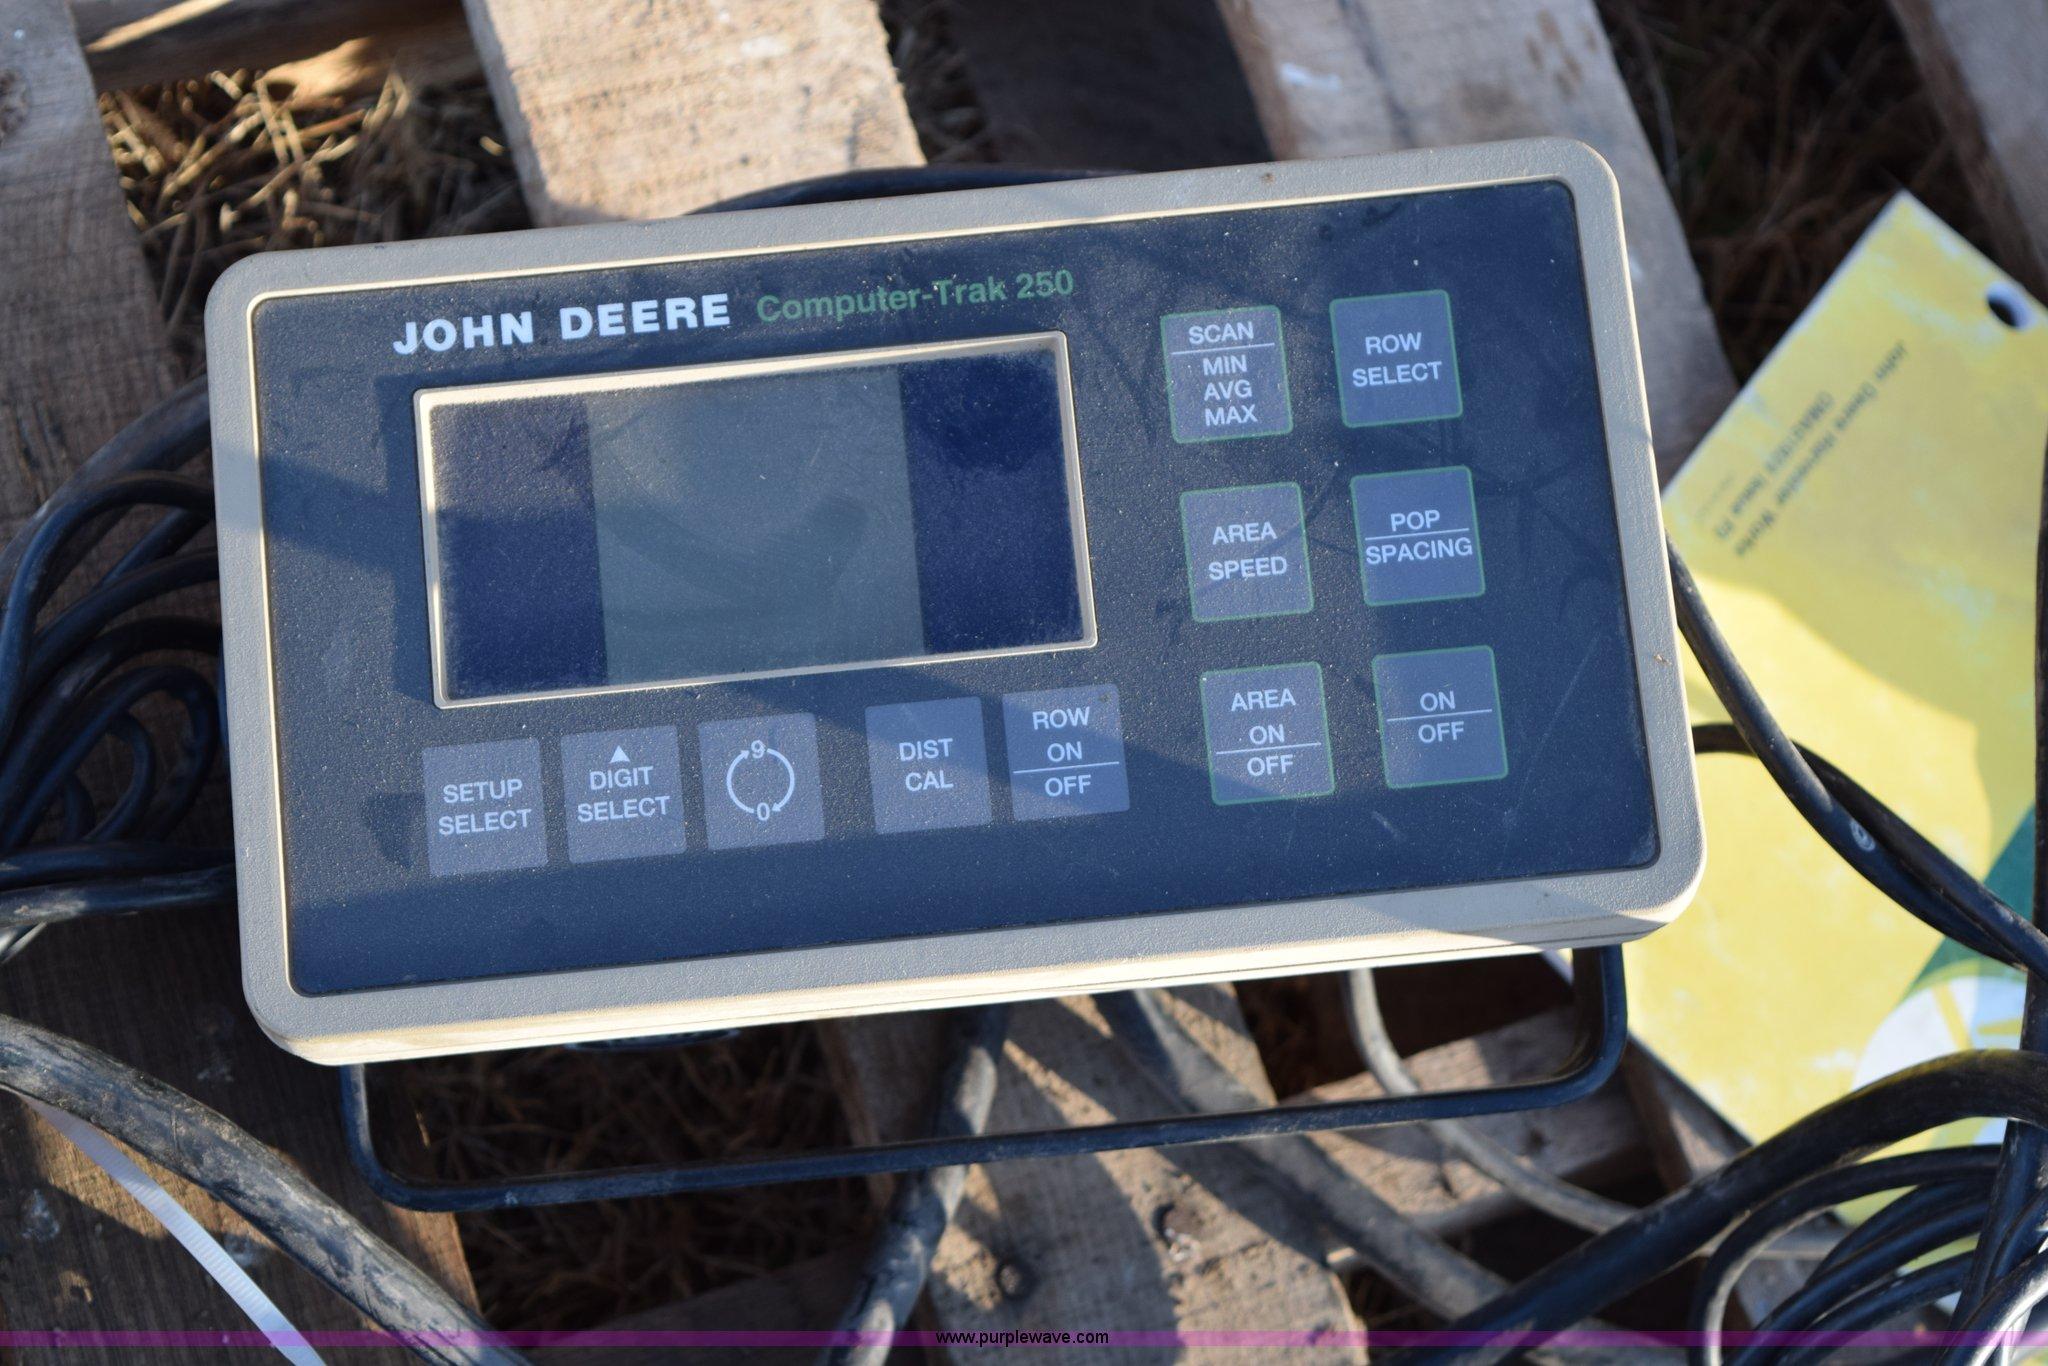 John Deere Computer Trak 250 Wiring Diagram - Complete Wiring Diagrams •